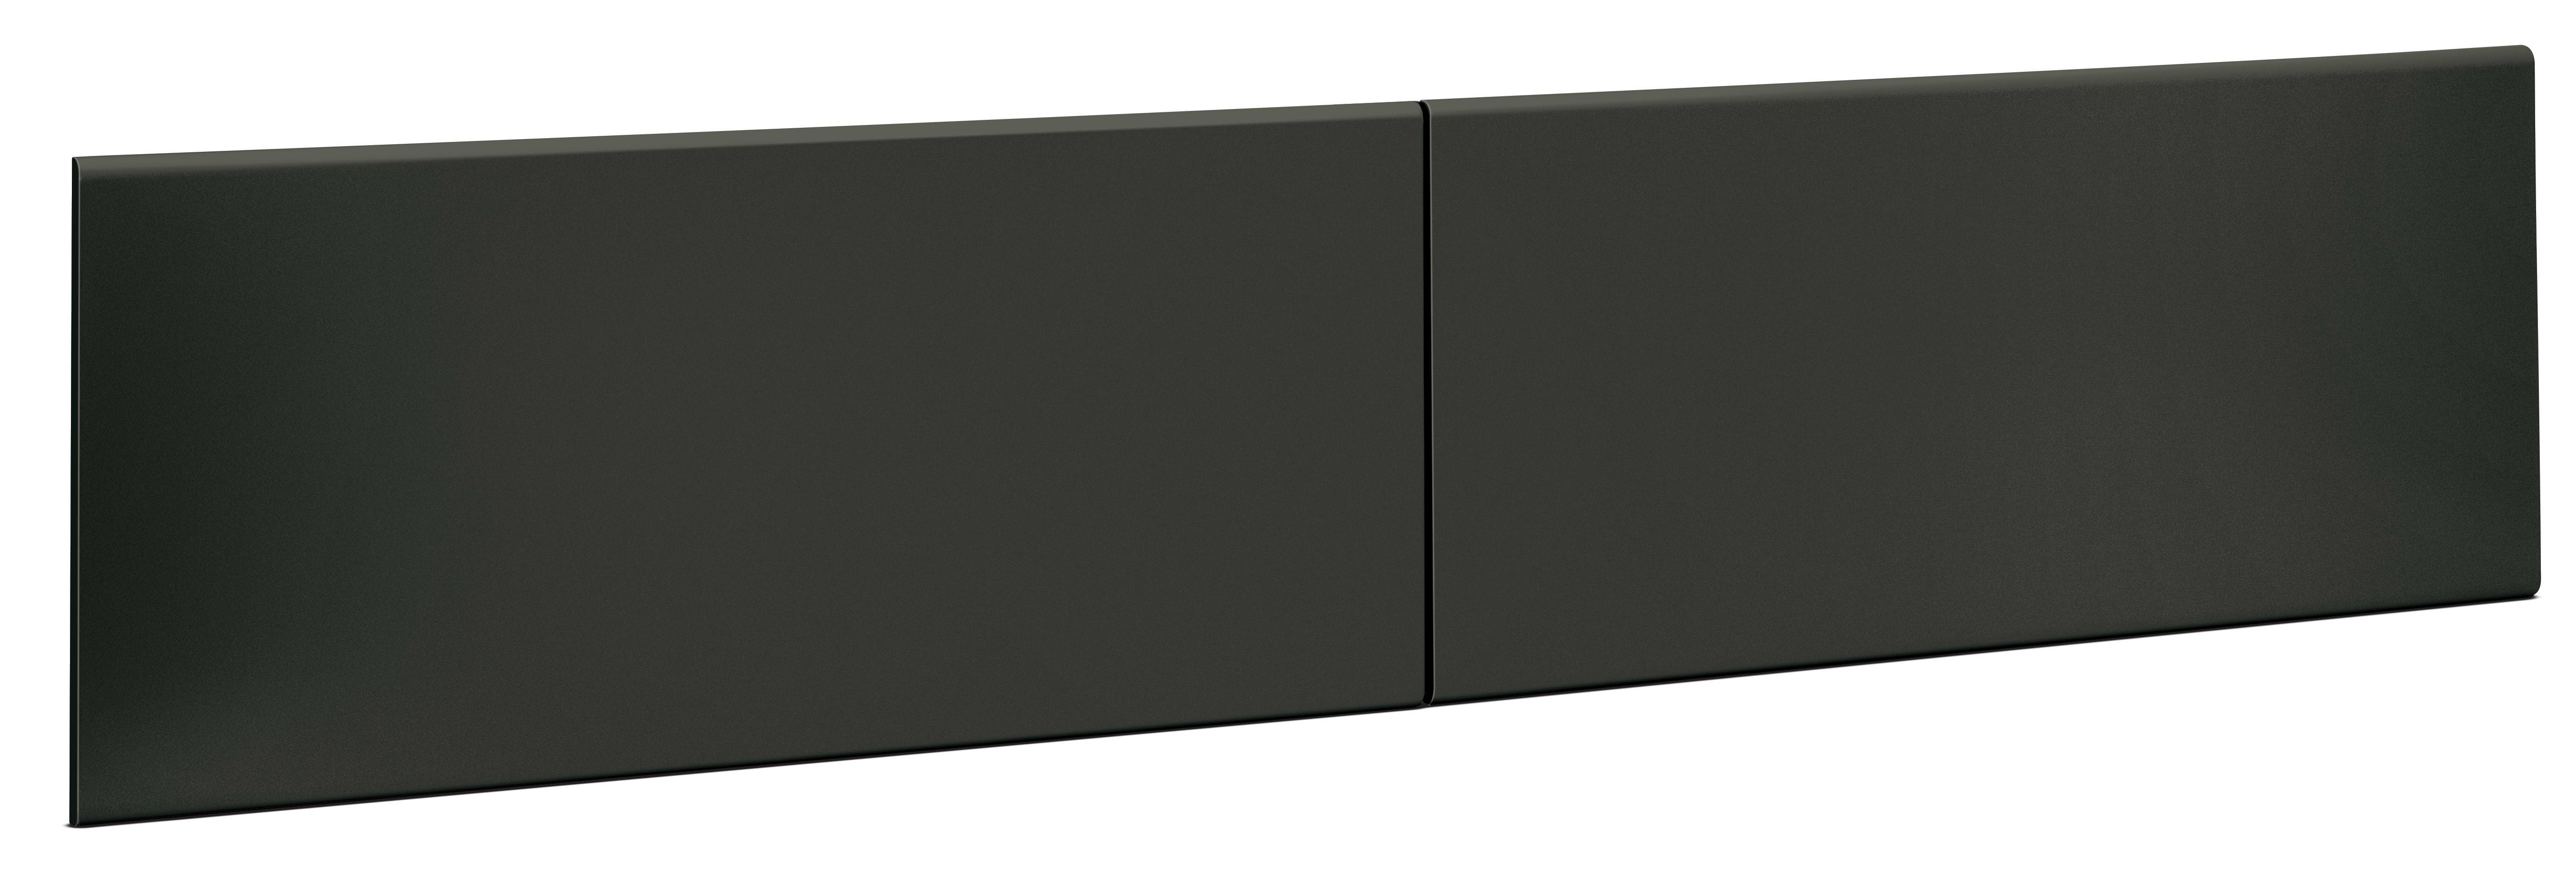 HON-38000Series-H386015.L.S-045-001